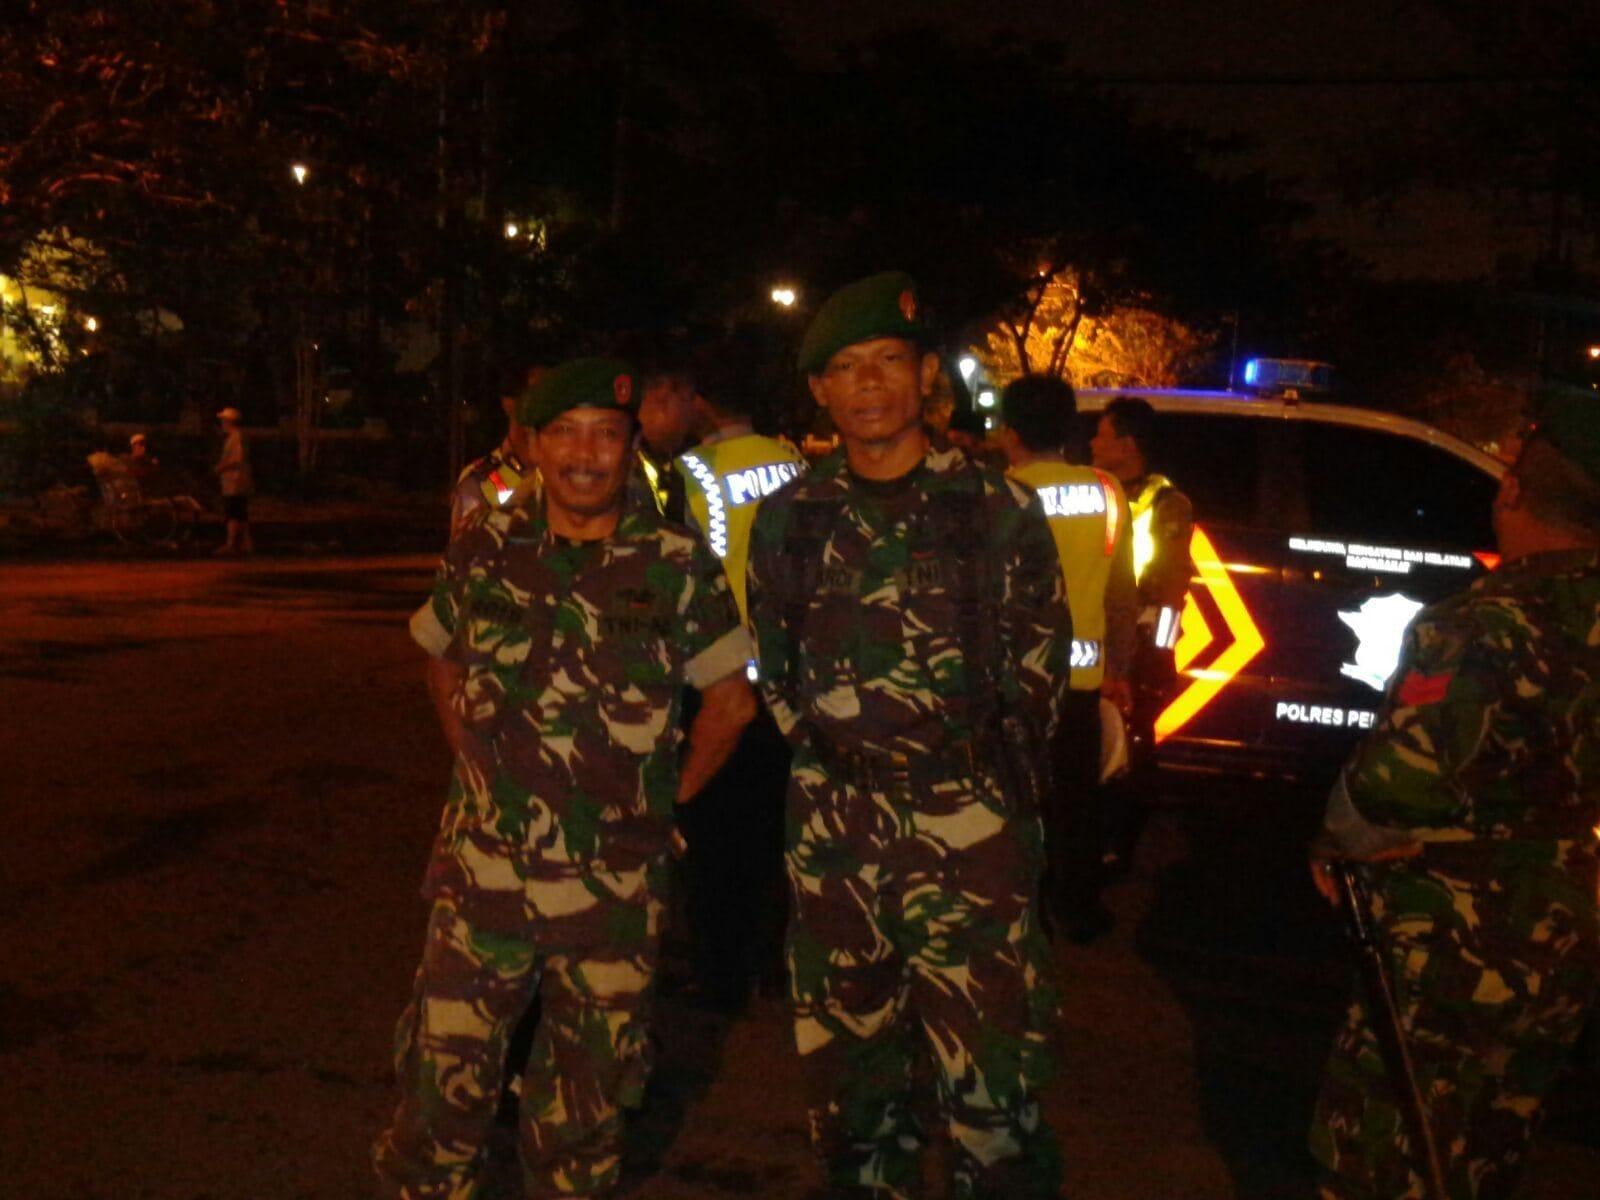 Jelang Pilkada, Karamil Pabean Cantain Kodim SU Intensifkan Patroli Gabungan